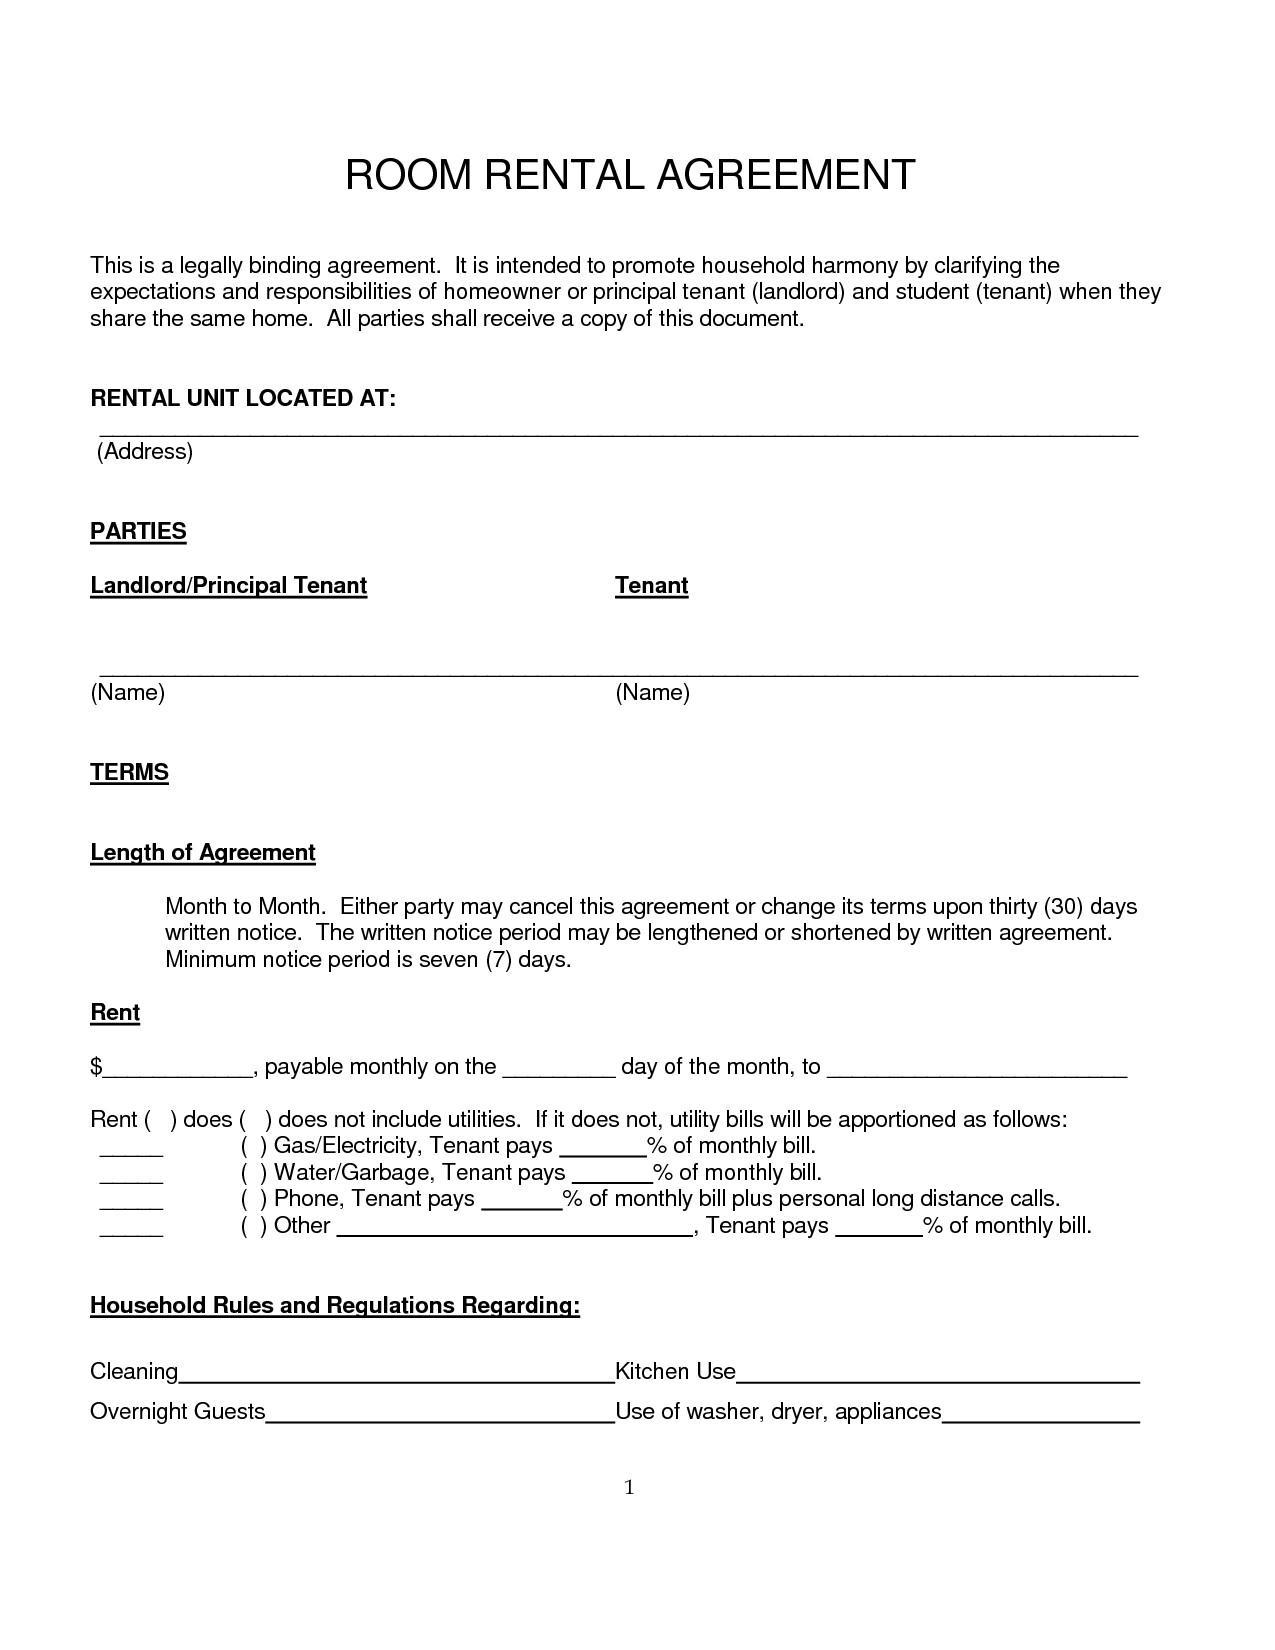 Basic Room Rental Agreement Template